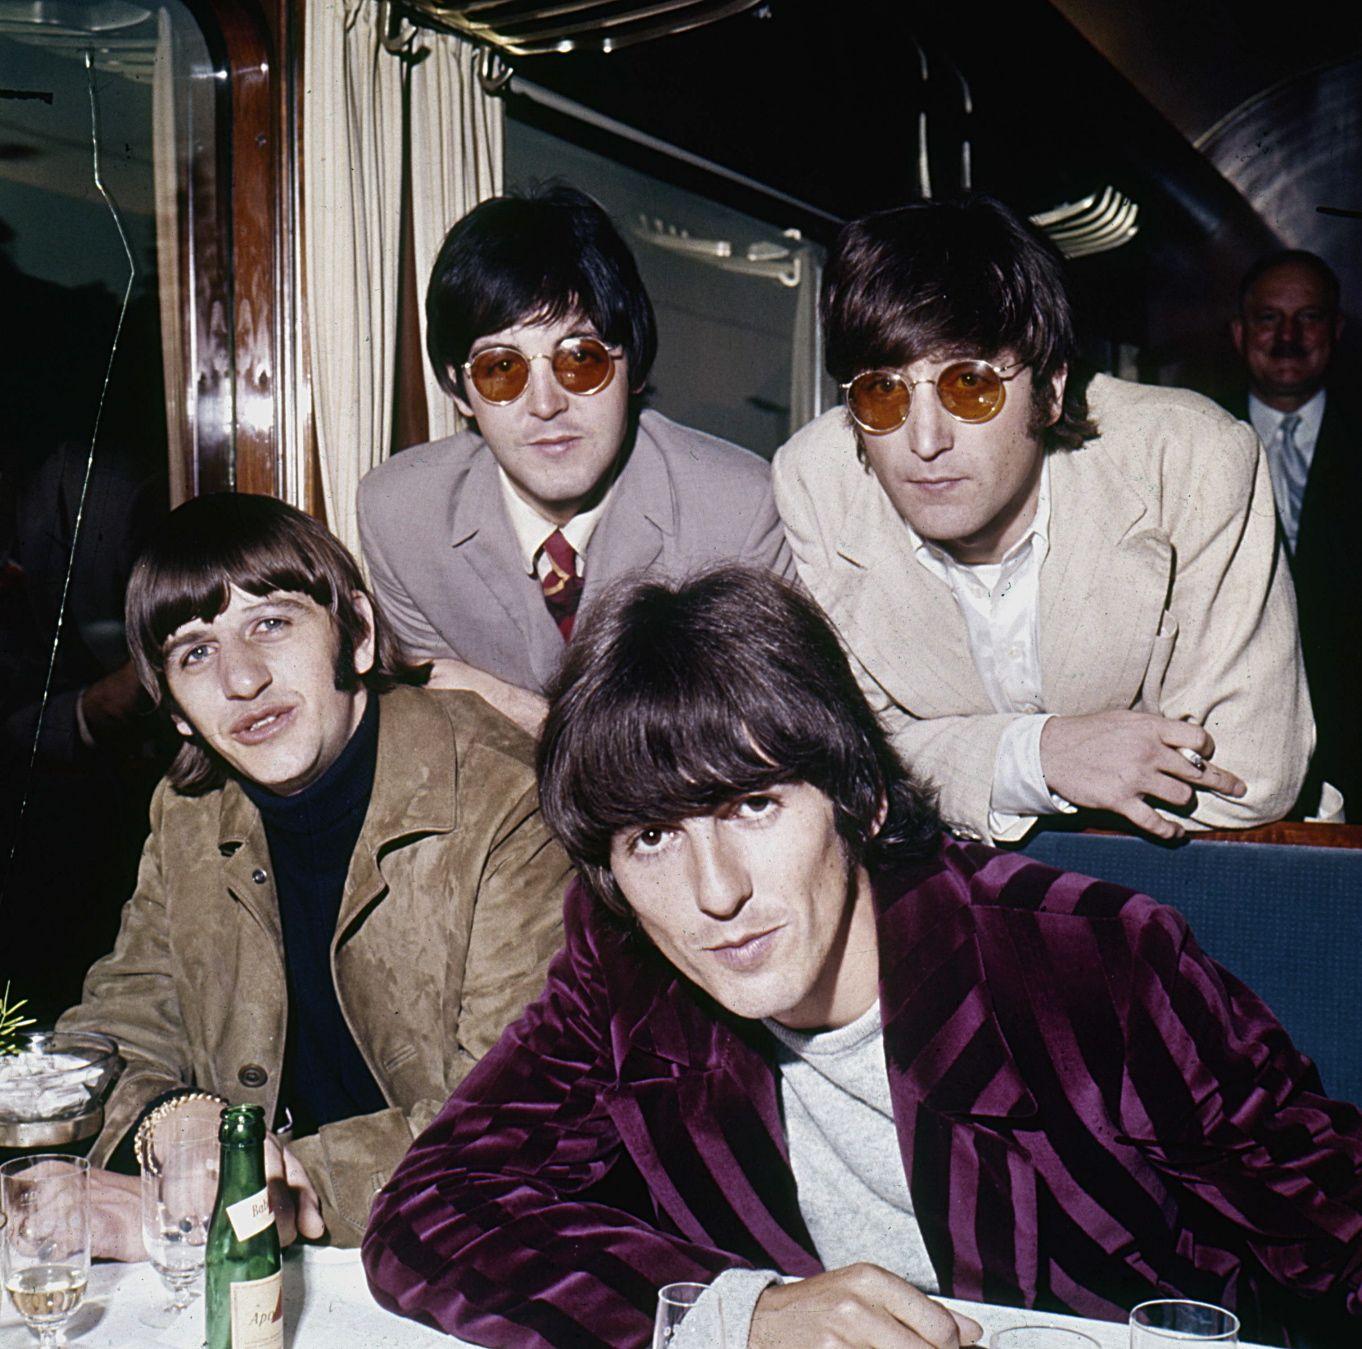 The Beatles circa early 1970's